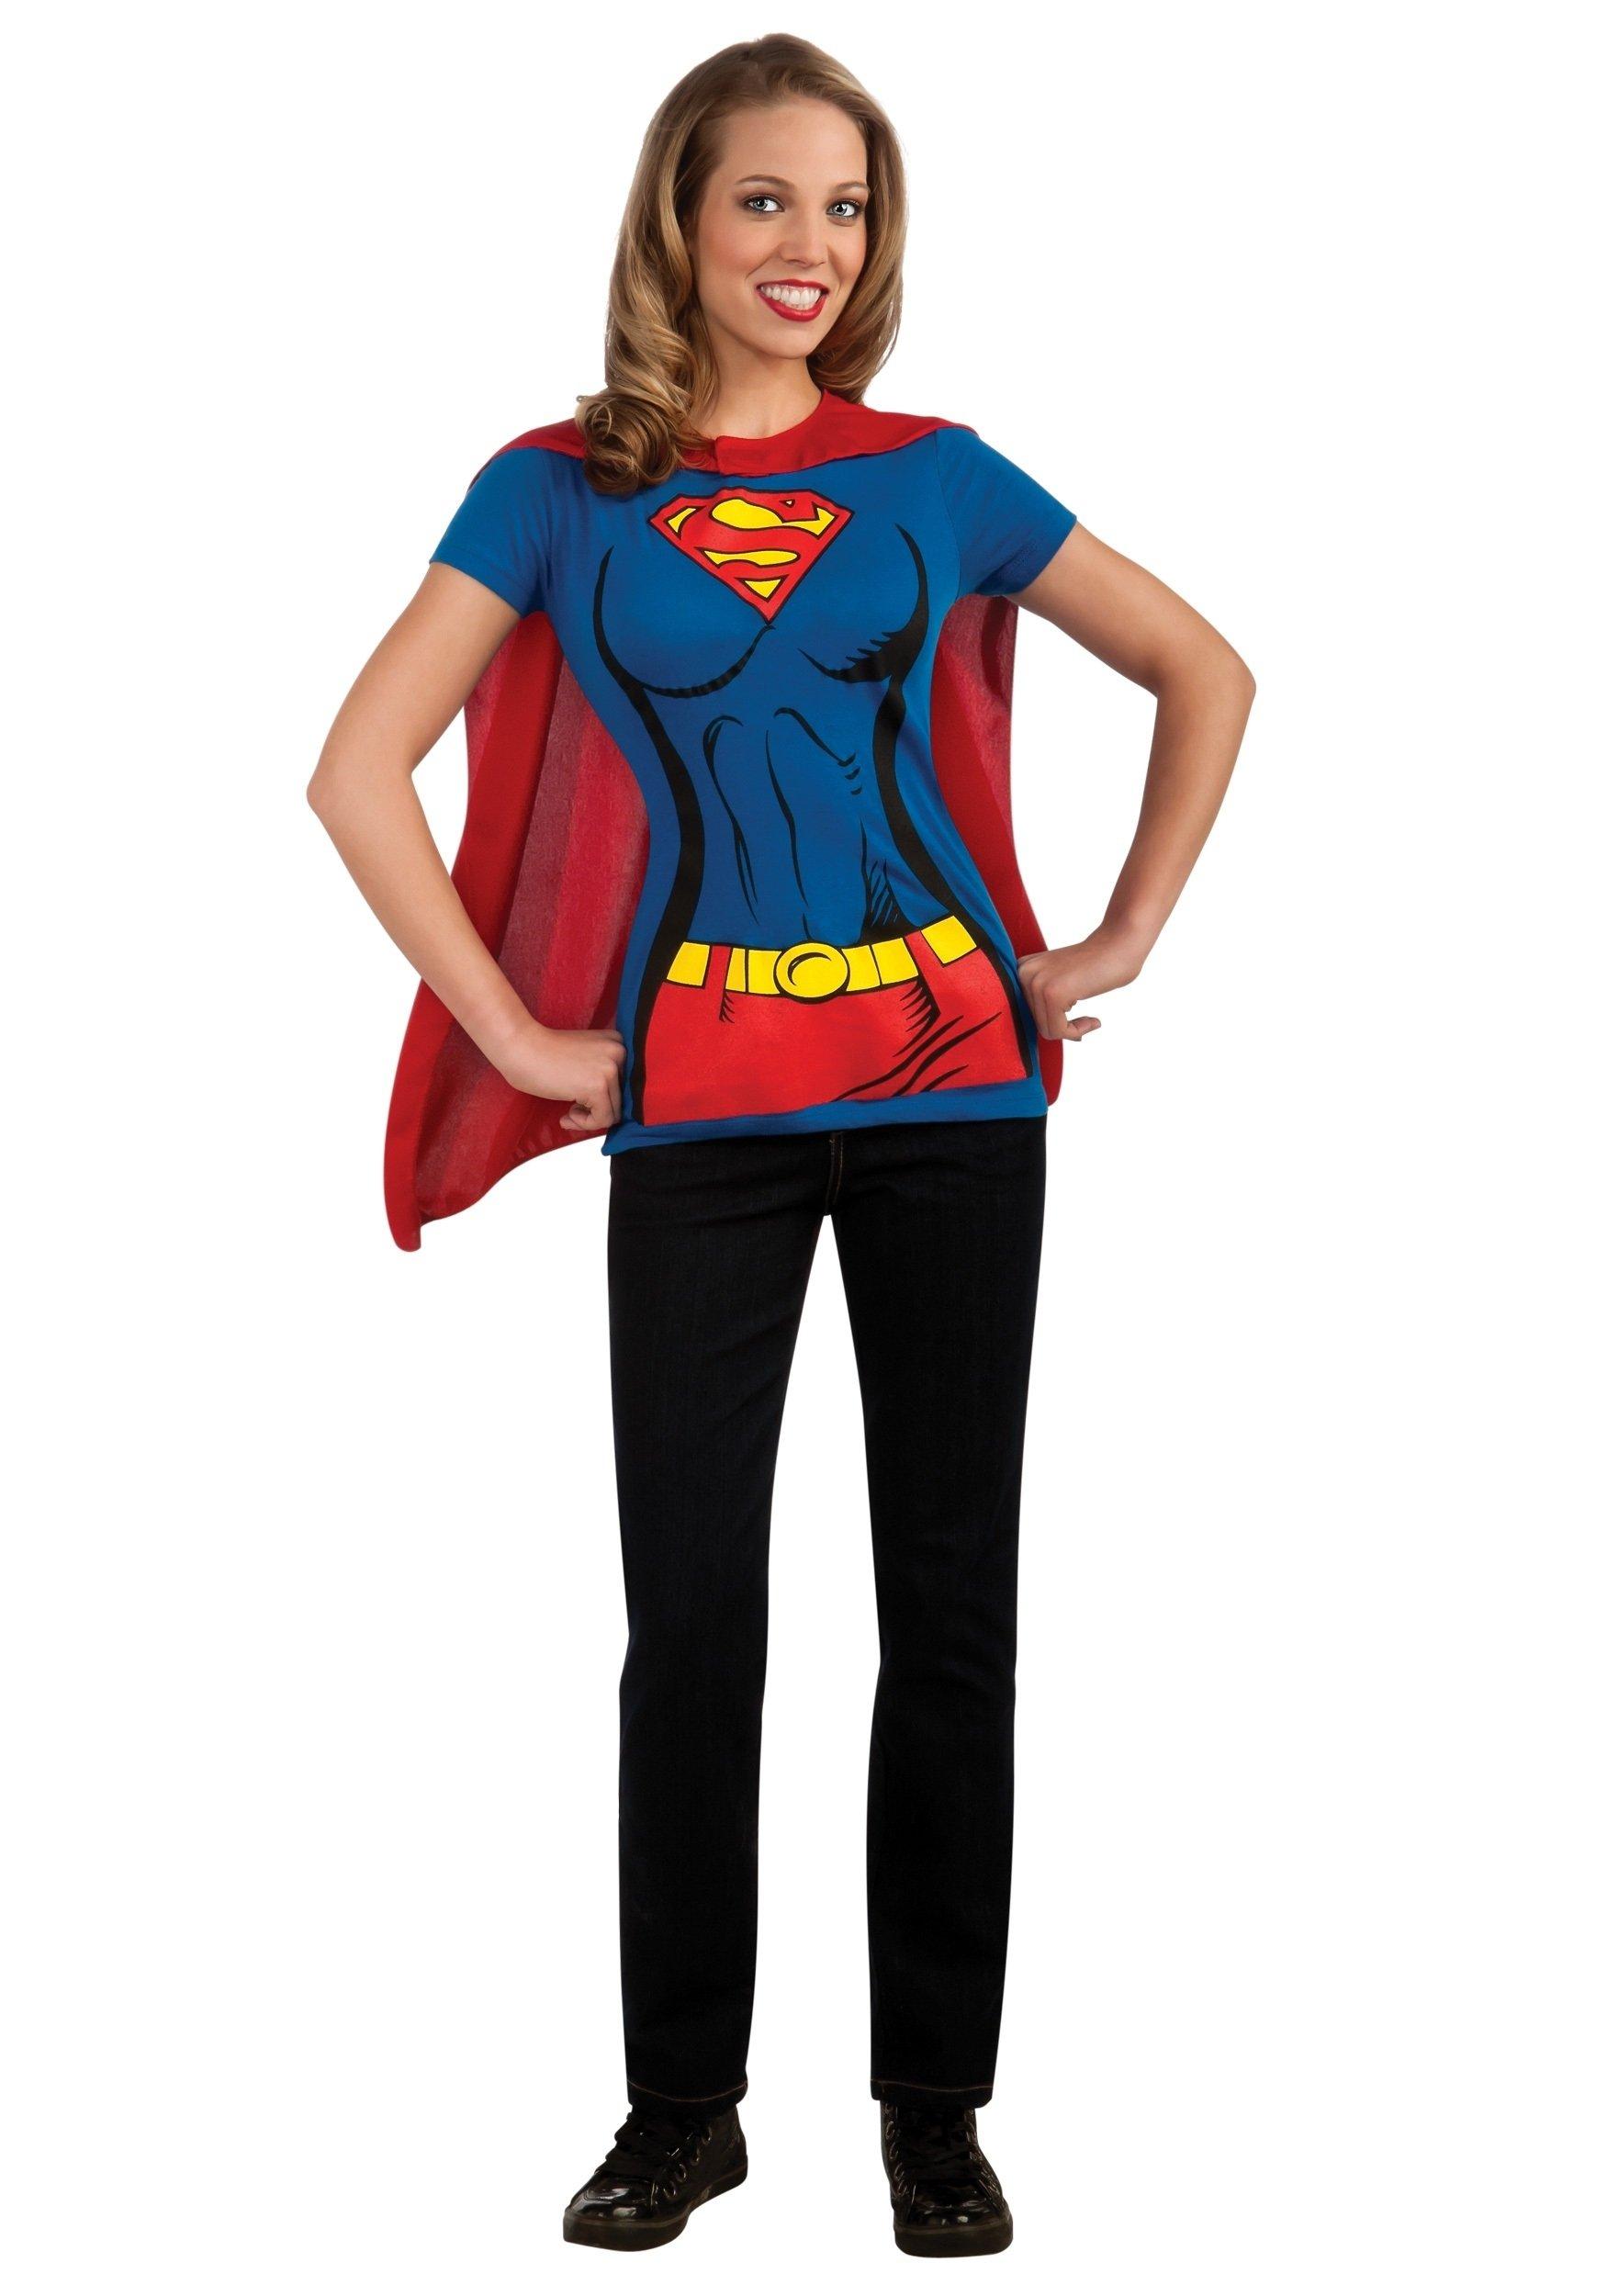 10 Stylish Superhero Costume Ideas For Women supergirl t shirt costume 2020